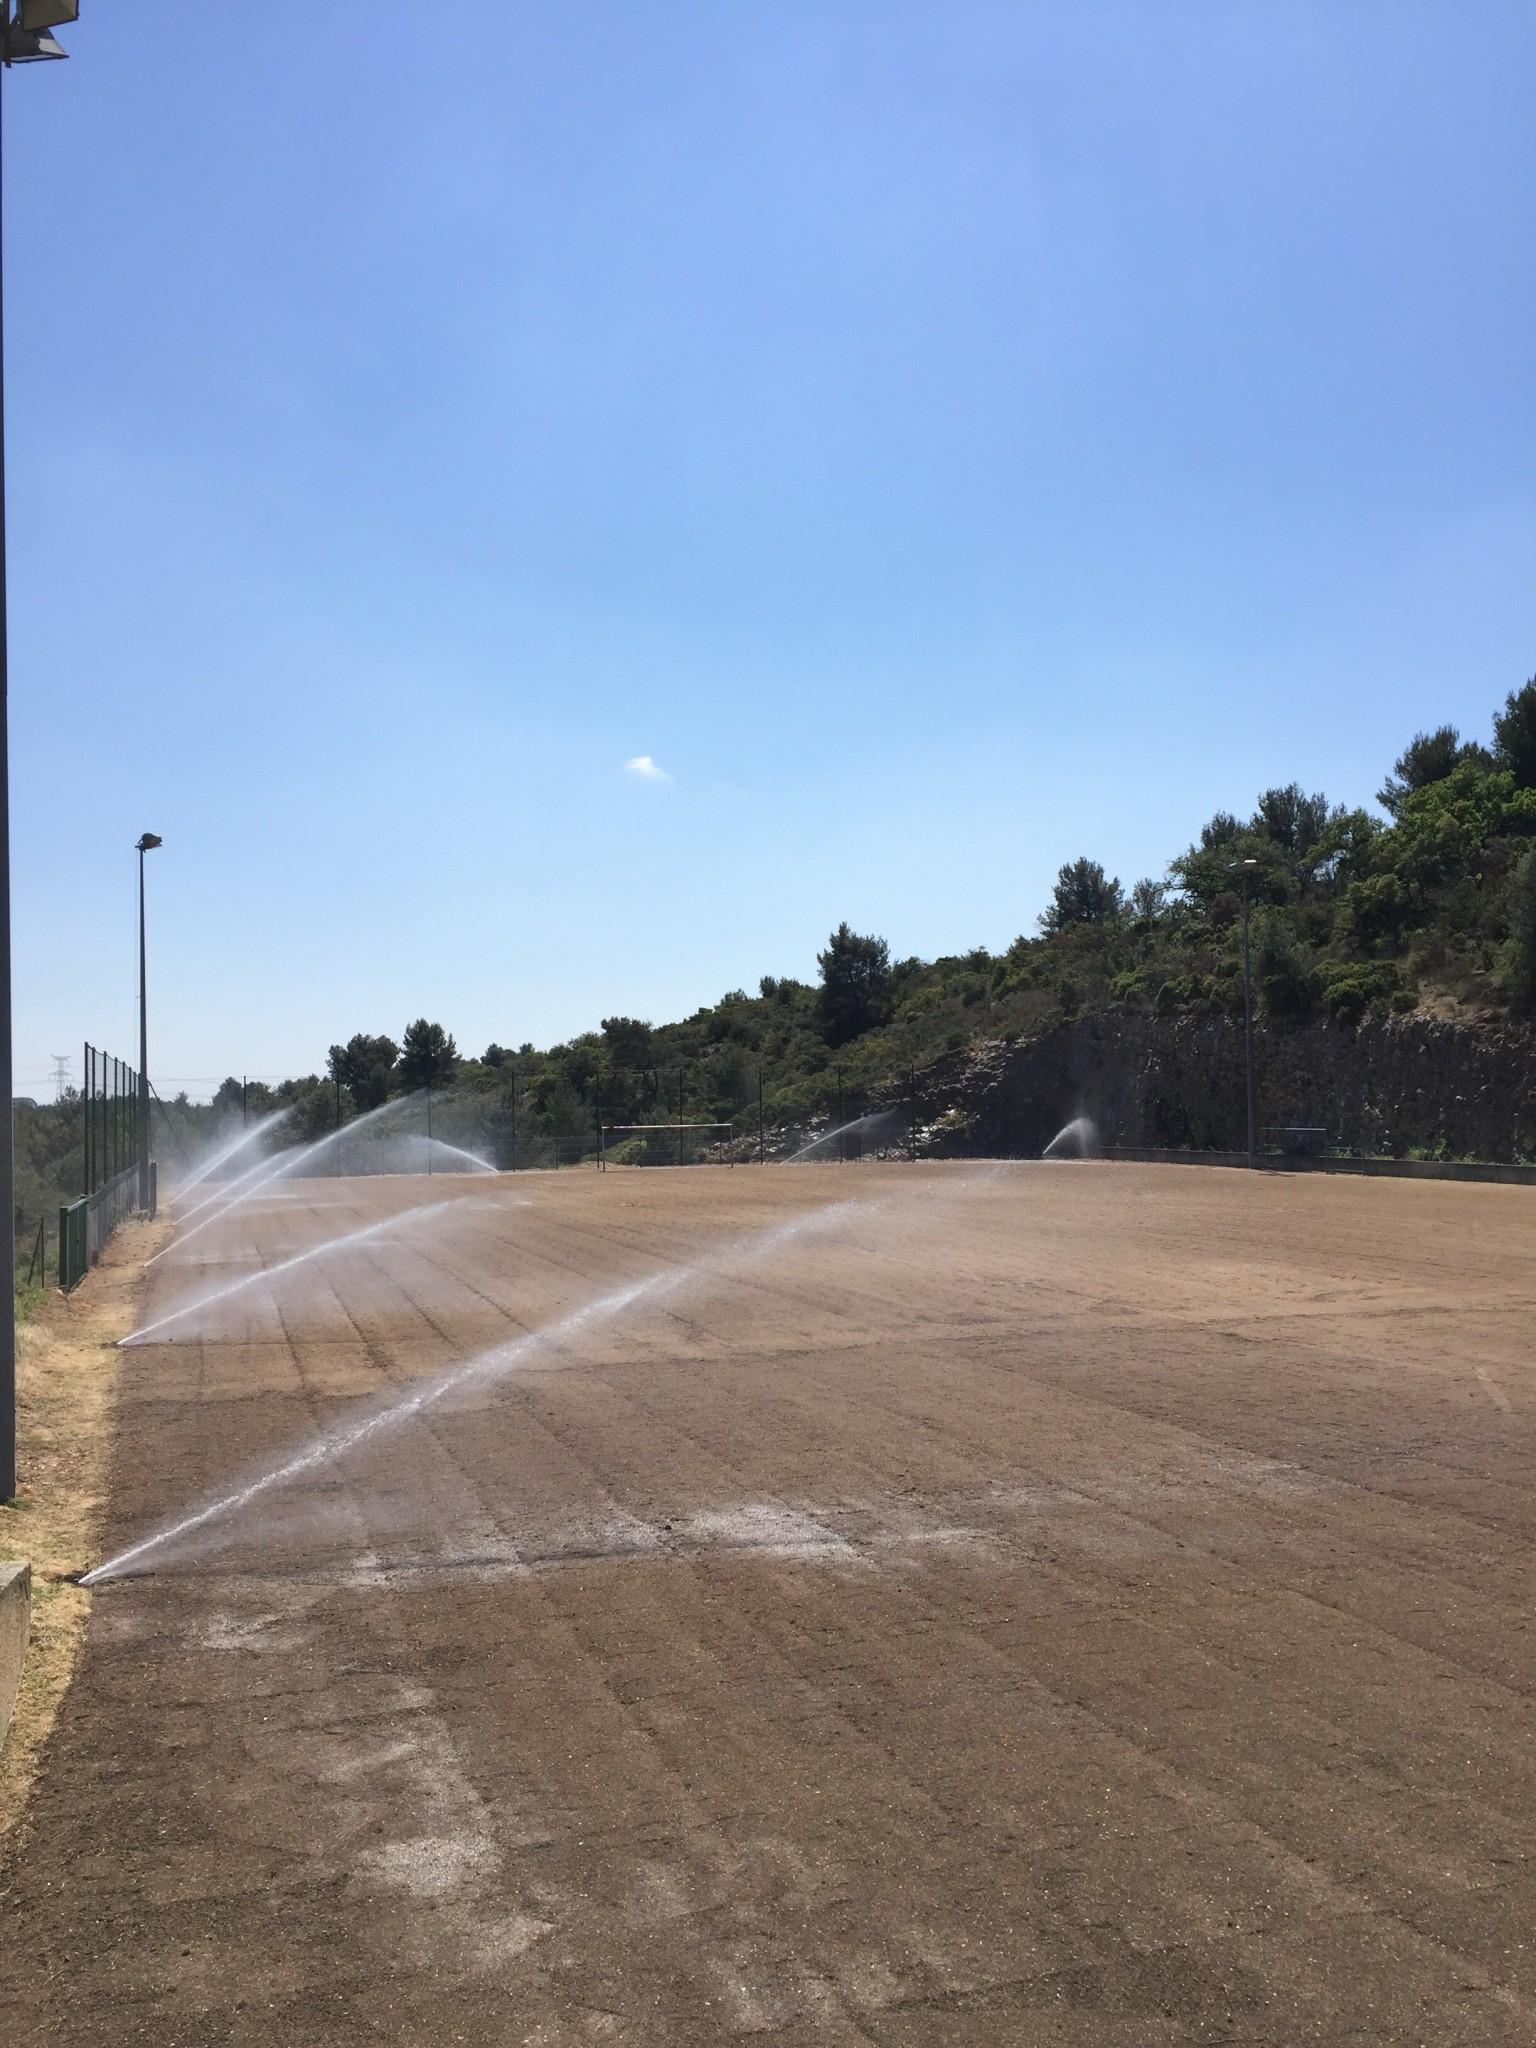 Gazon pour terrain de foot aix en provence for Le jardin des 5 sens aix en provence